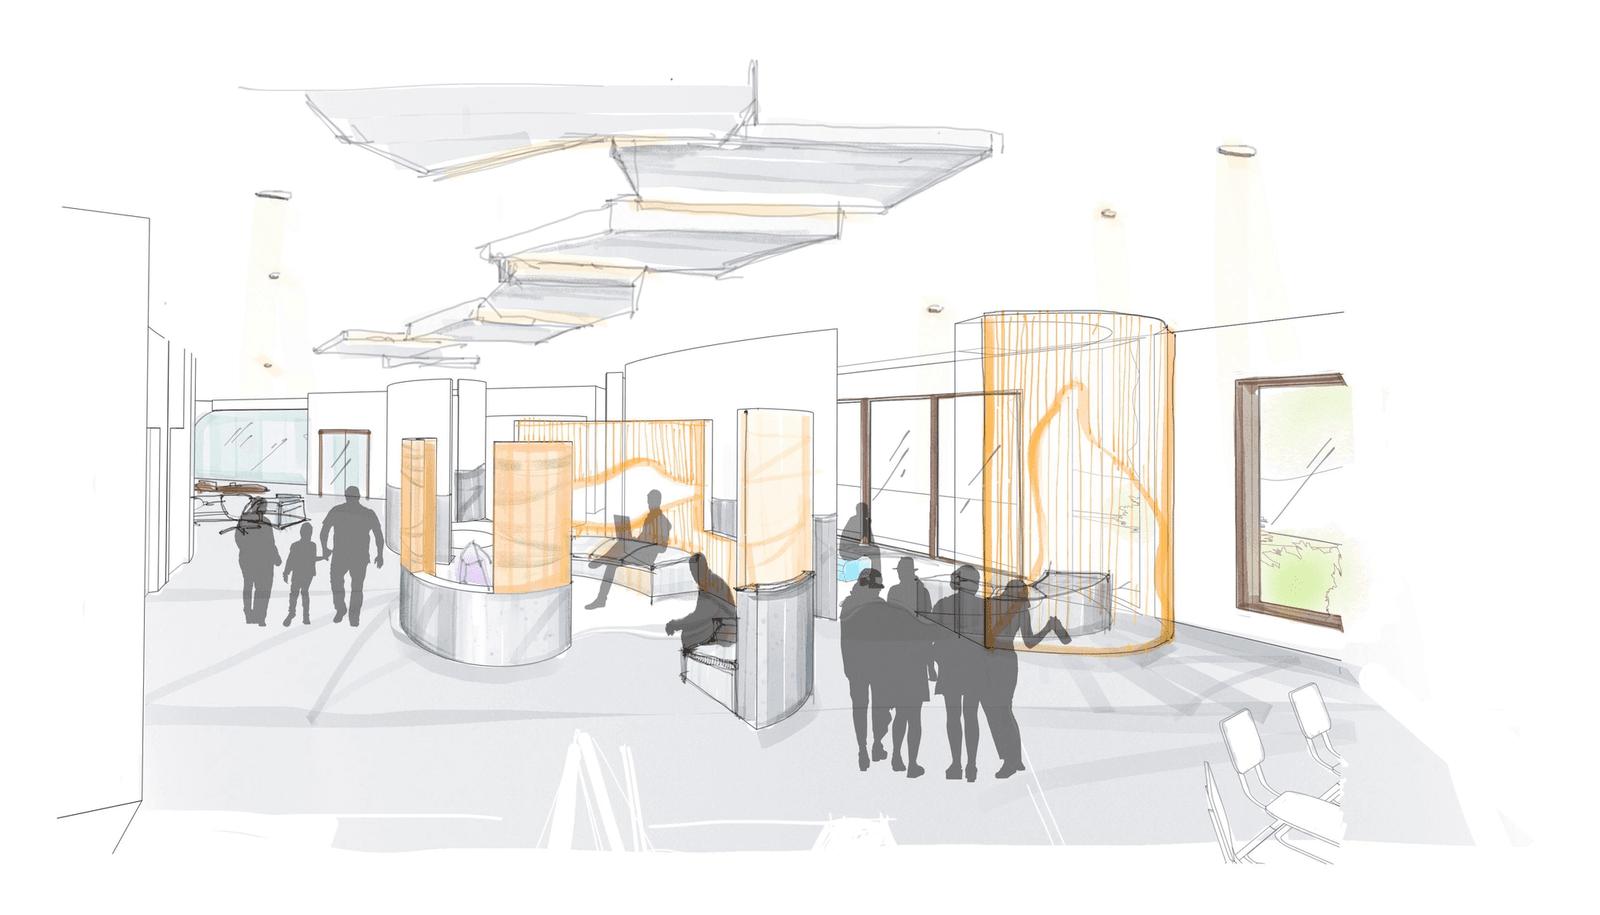 Community Center - Sketch